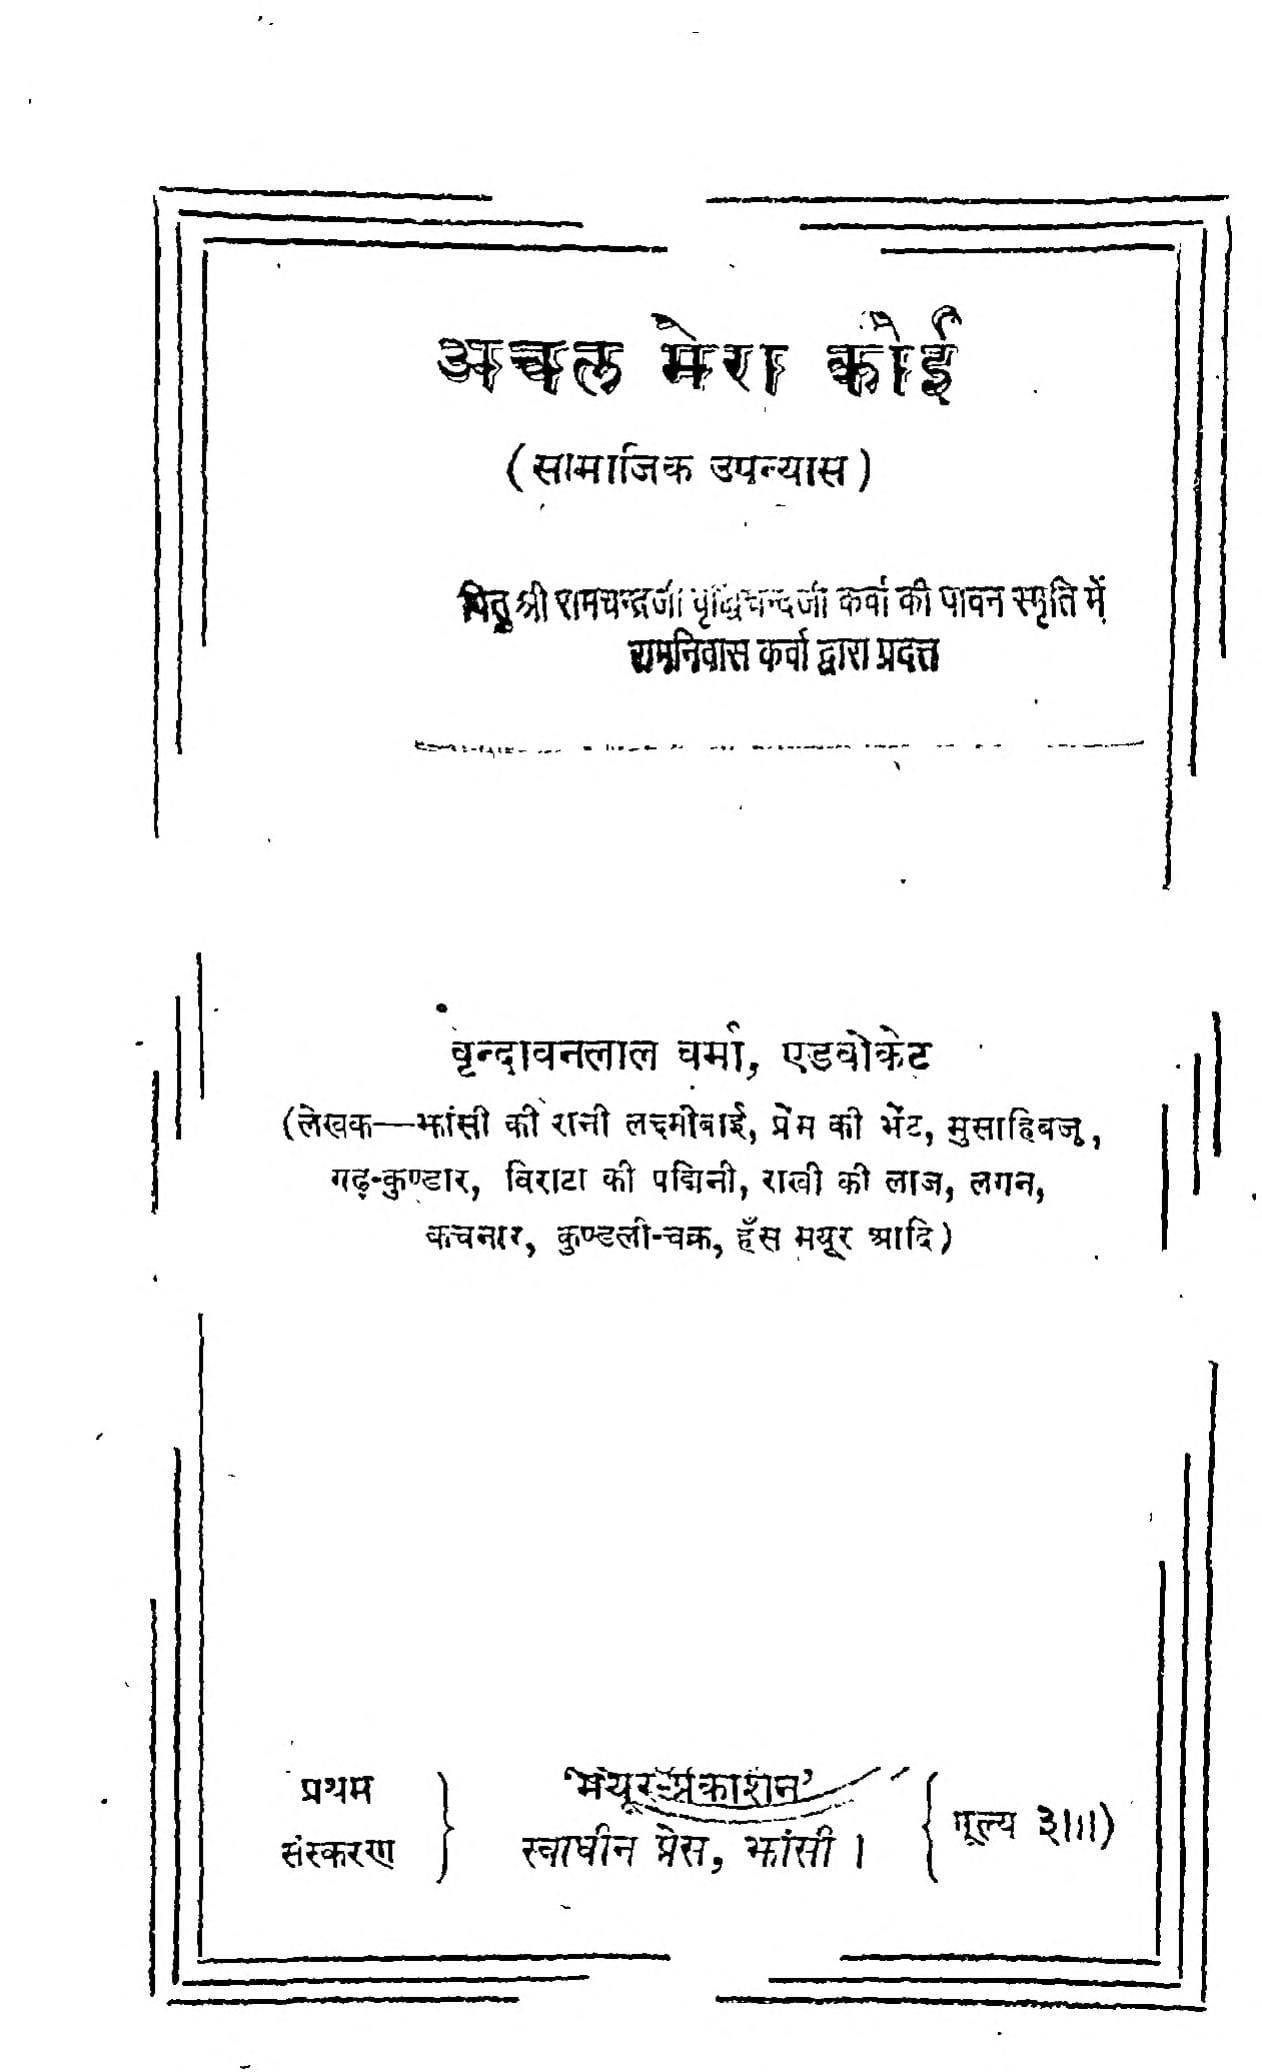 Book Image : अचल मेरा कोई (सामाजिक उपन्यास) - Achal Mera Koi (Samajik Upanyas)